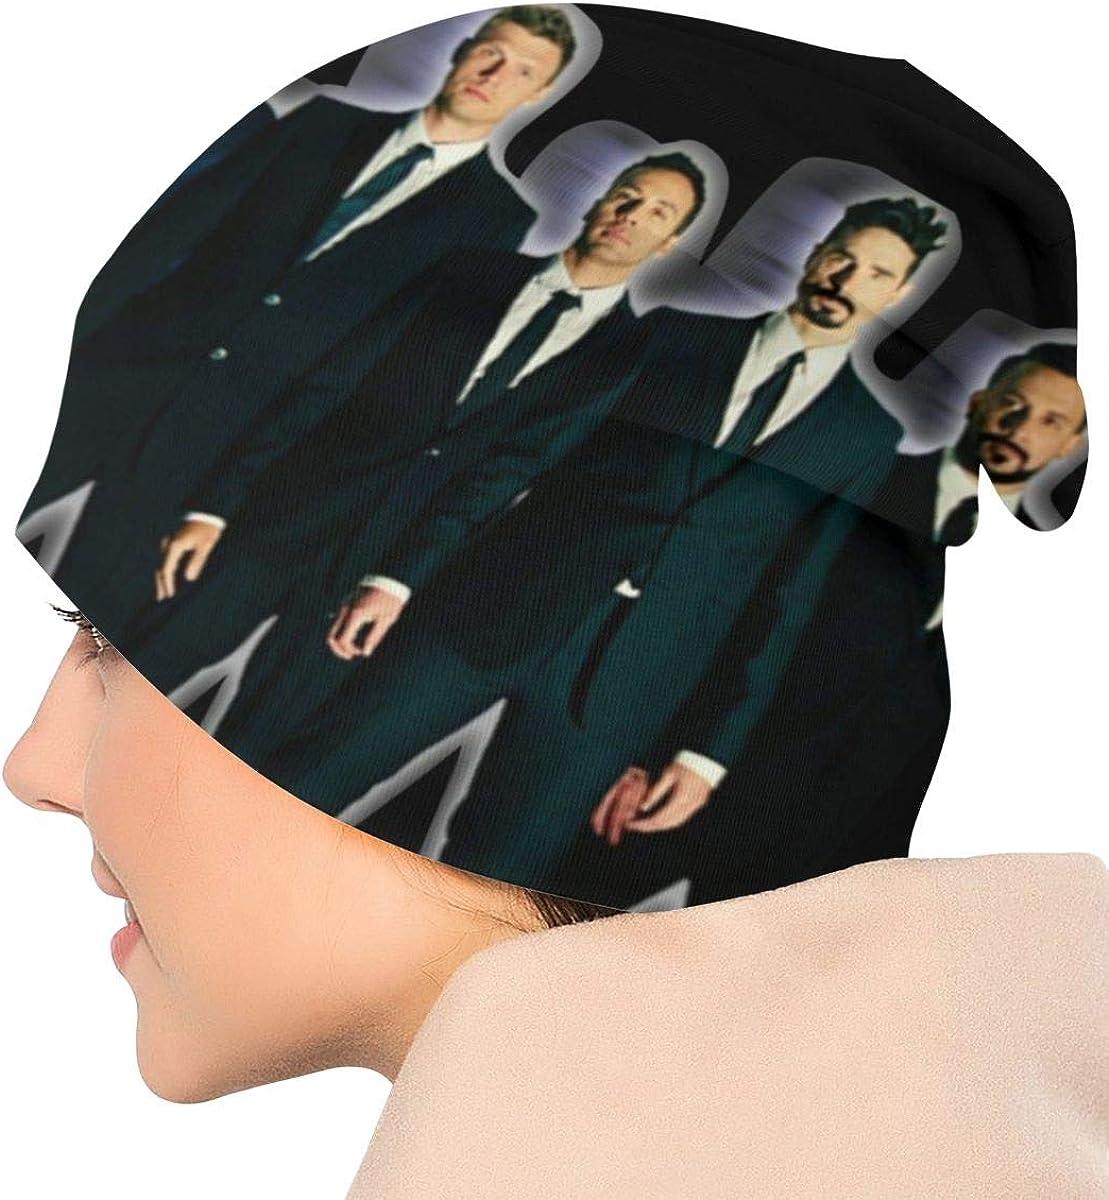 Backstreet Boys Knit Hat Warm Soft Comfortable Warm Winter Beanie Print Cap for Men and Women Black